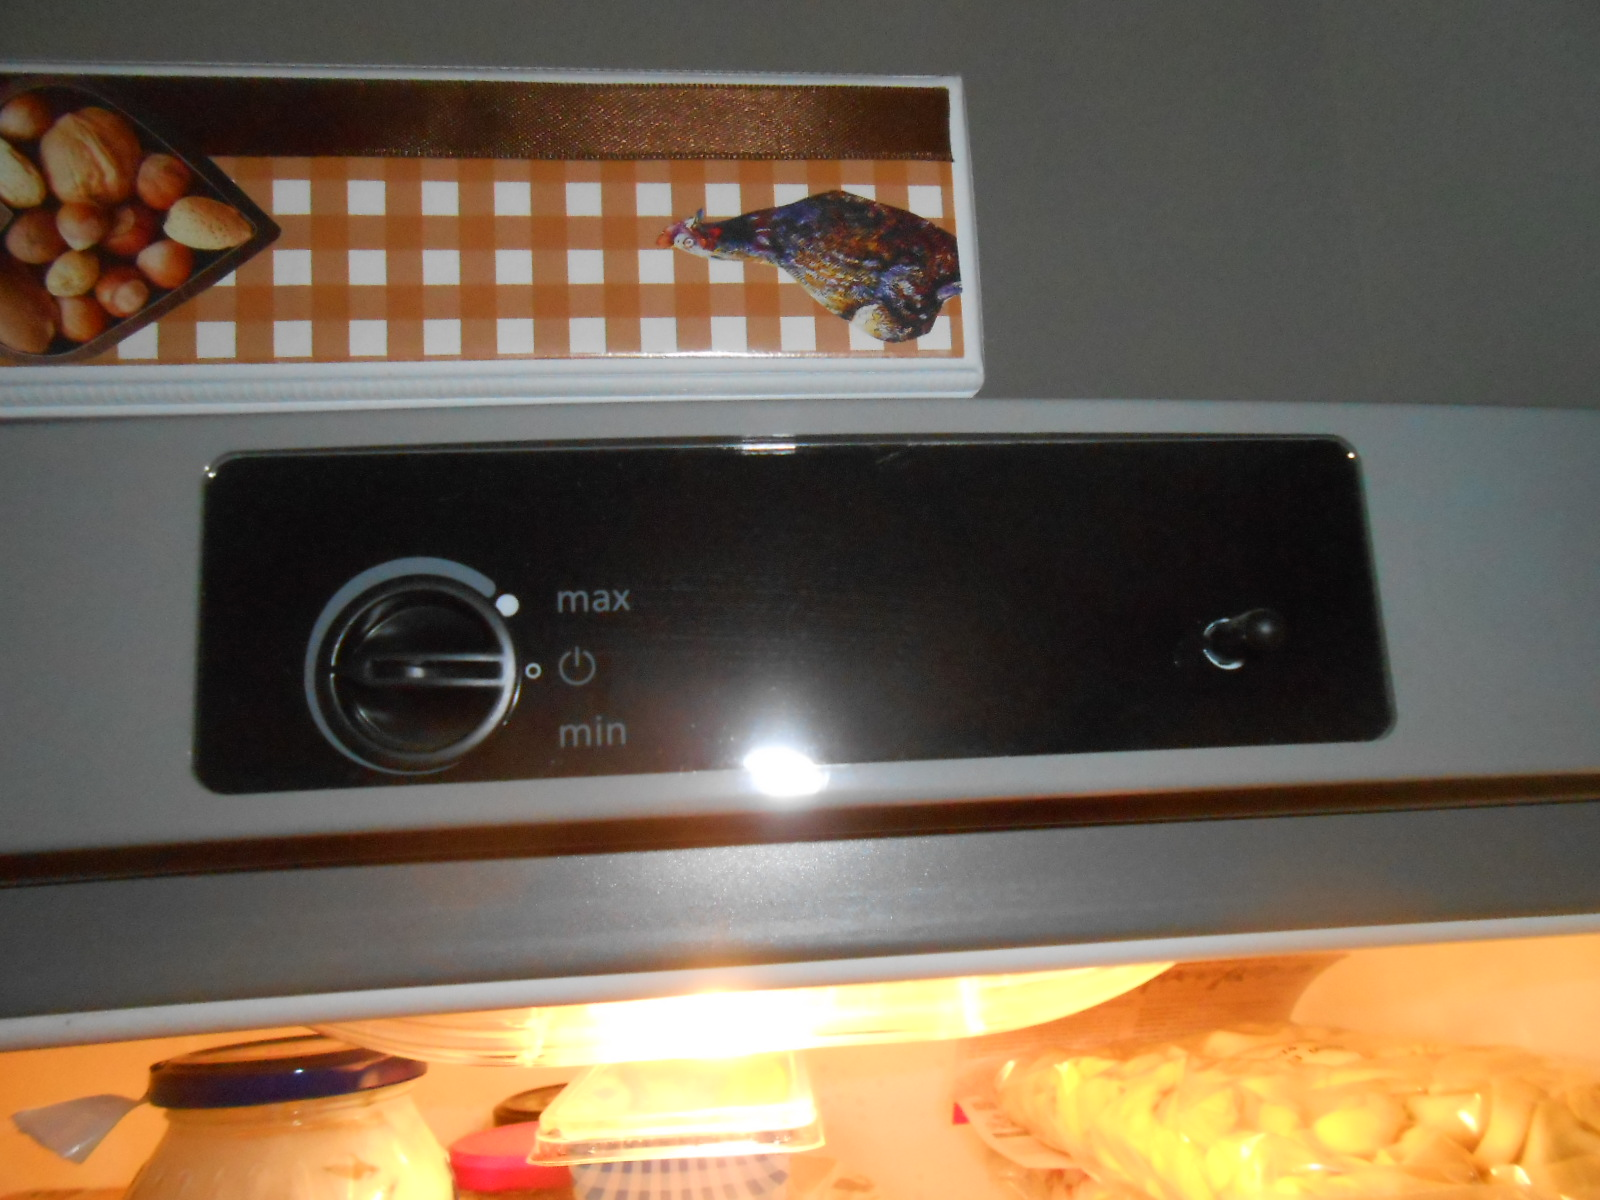 Kühlschrank Gorenje : Gorenje kühlschrank minmax temperatur regler